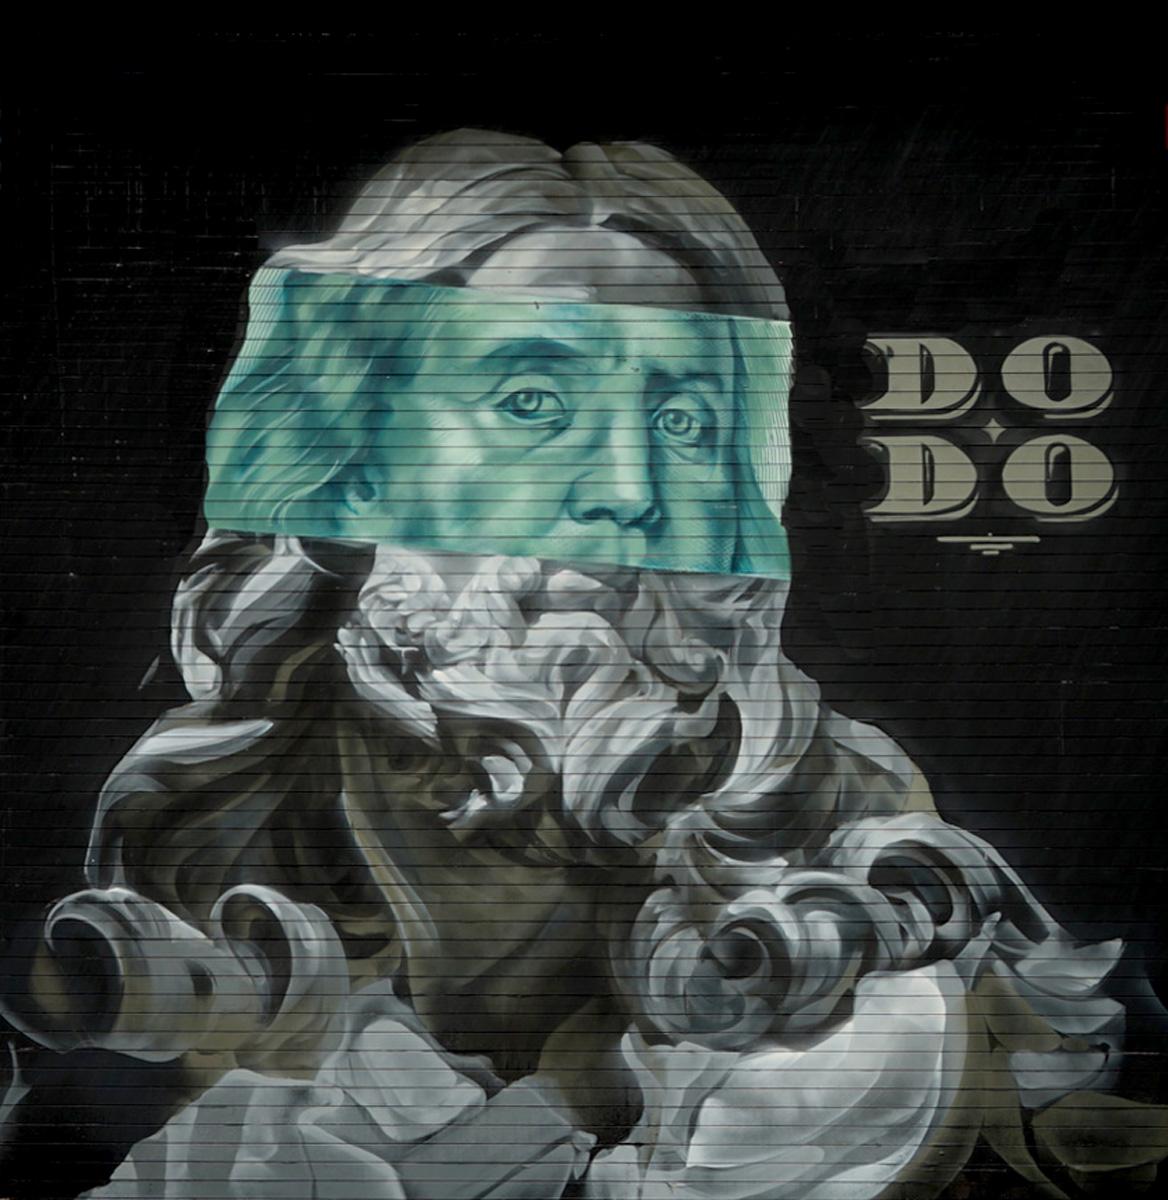 DODO-HOLY MONEY-MIAMI ART BASEL 2016.jpg